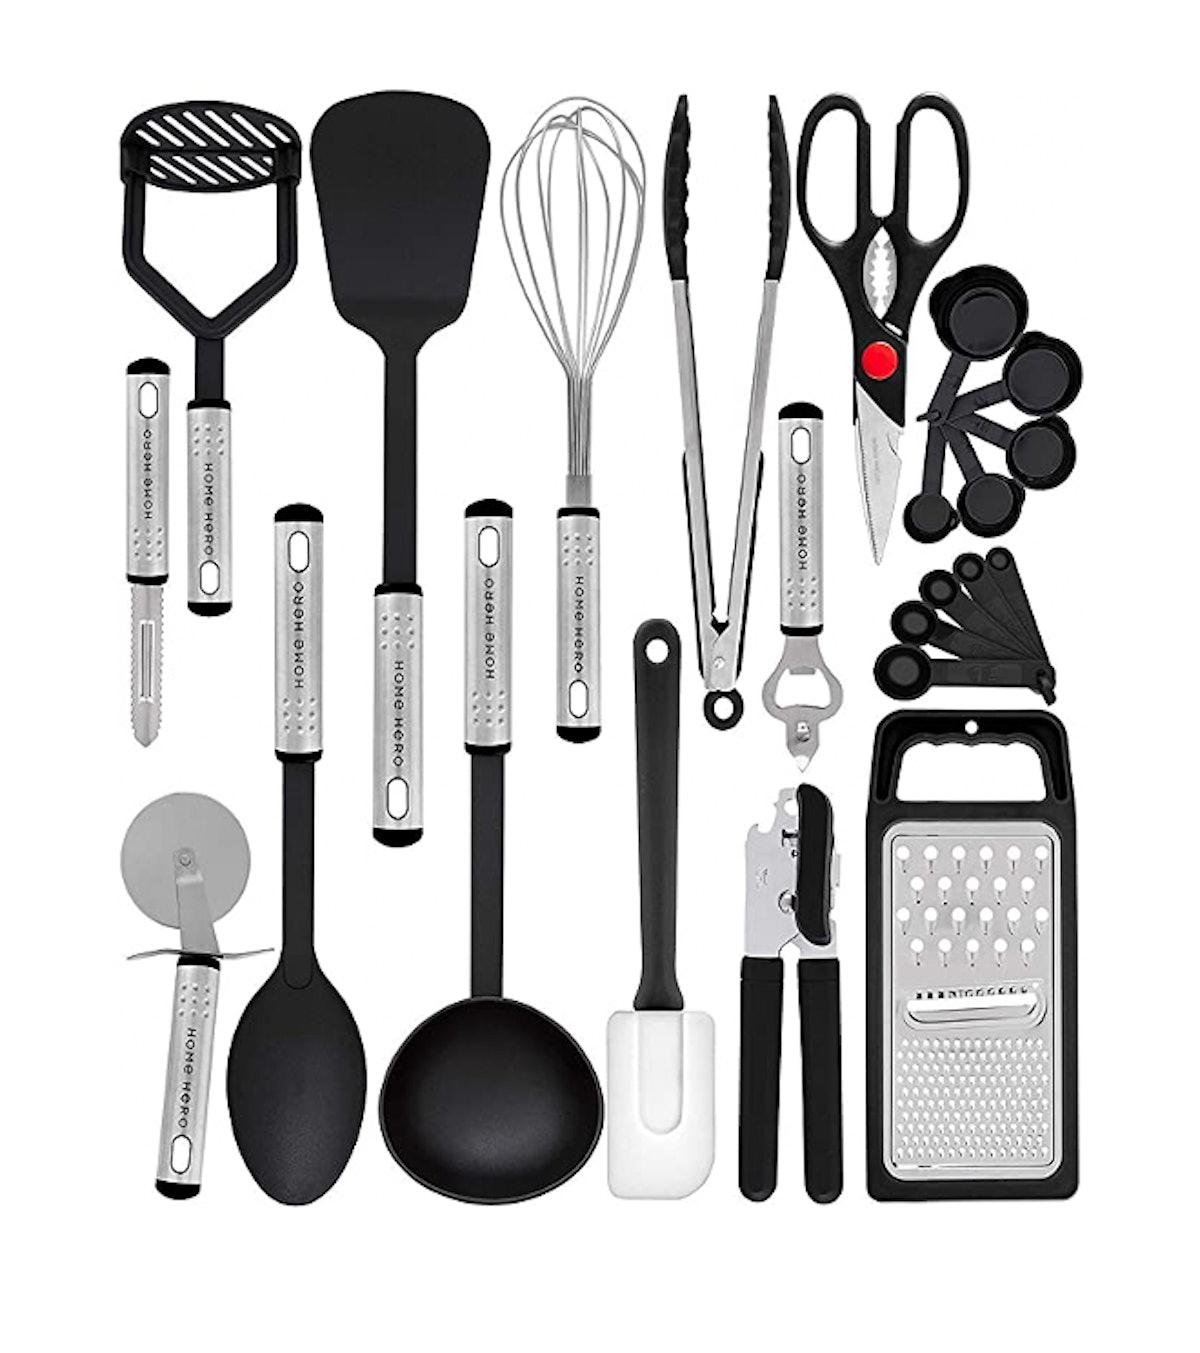 Home Hero Kitchen Utensil Set (23 Pieces)